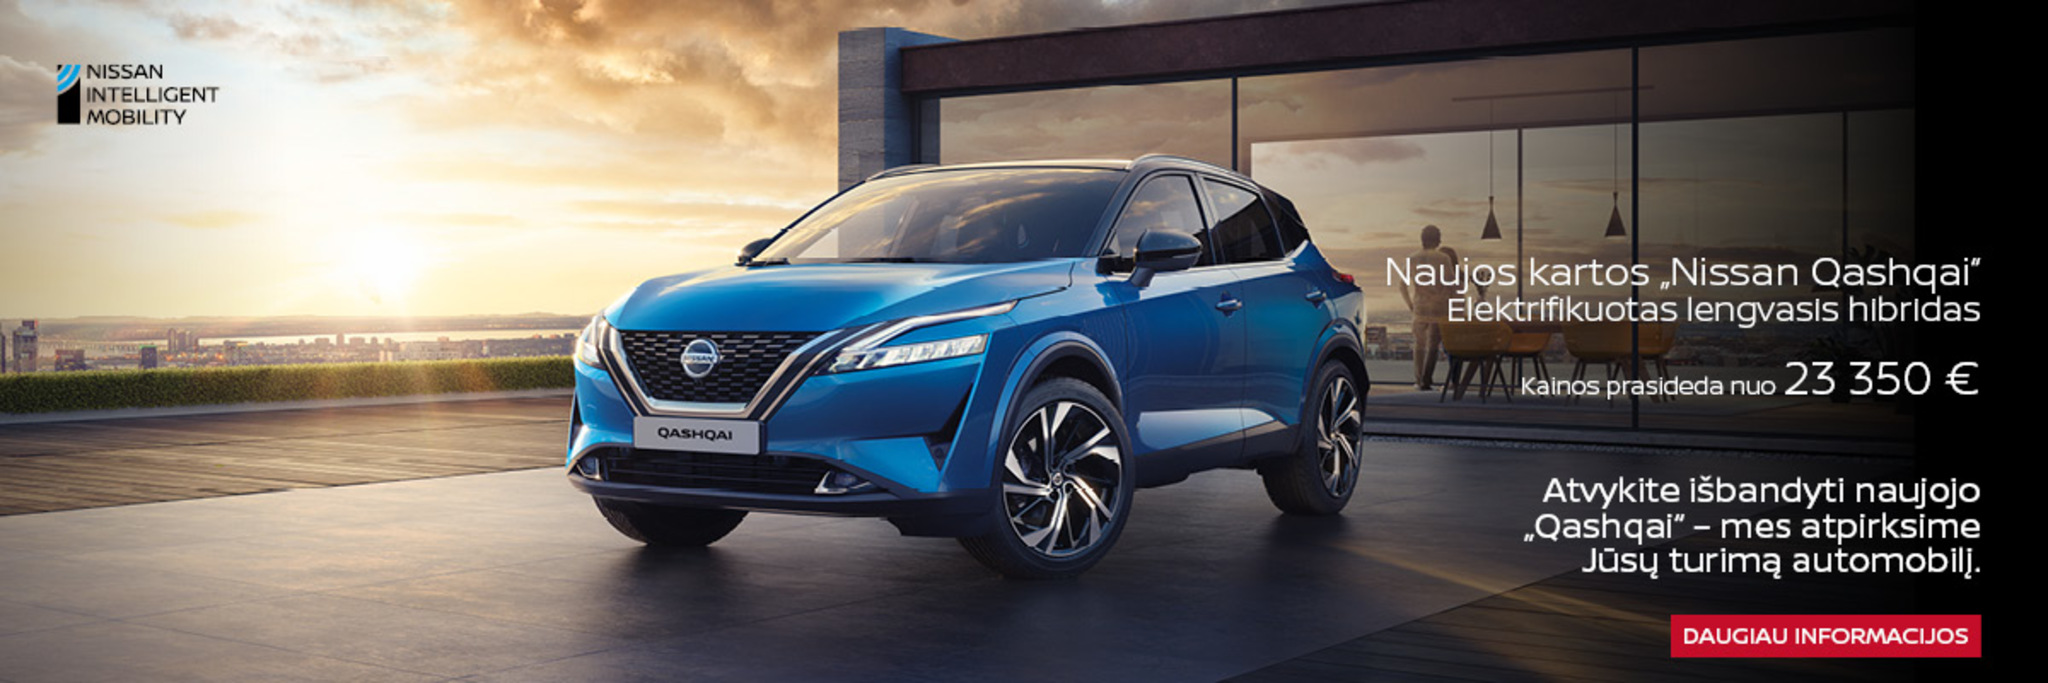 Naujasis Nissan Qashai